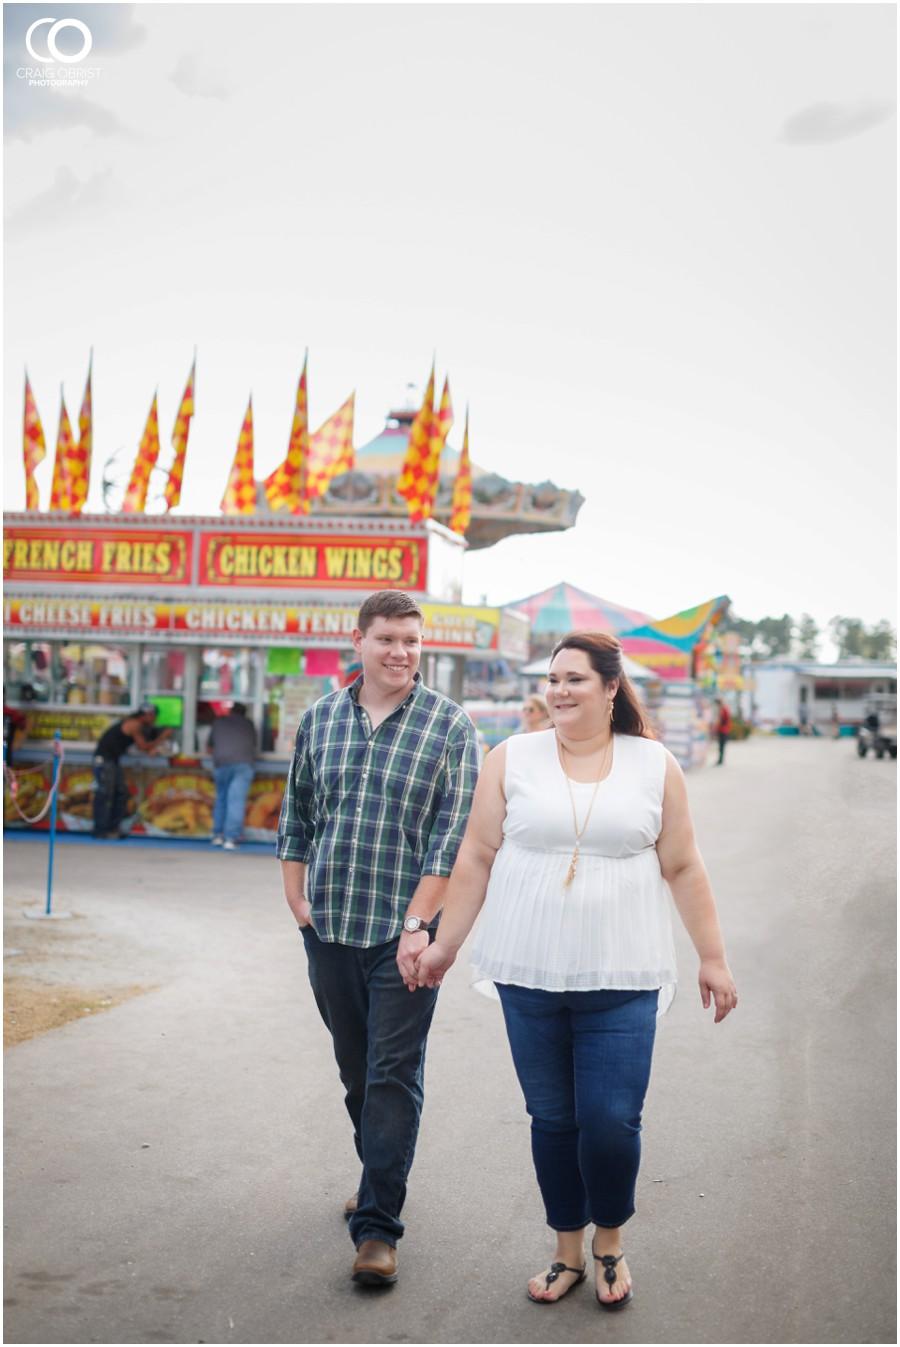 Gwinnett County Fair Engagement Portraits Ferris Wheel_0002.jpg